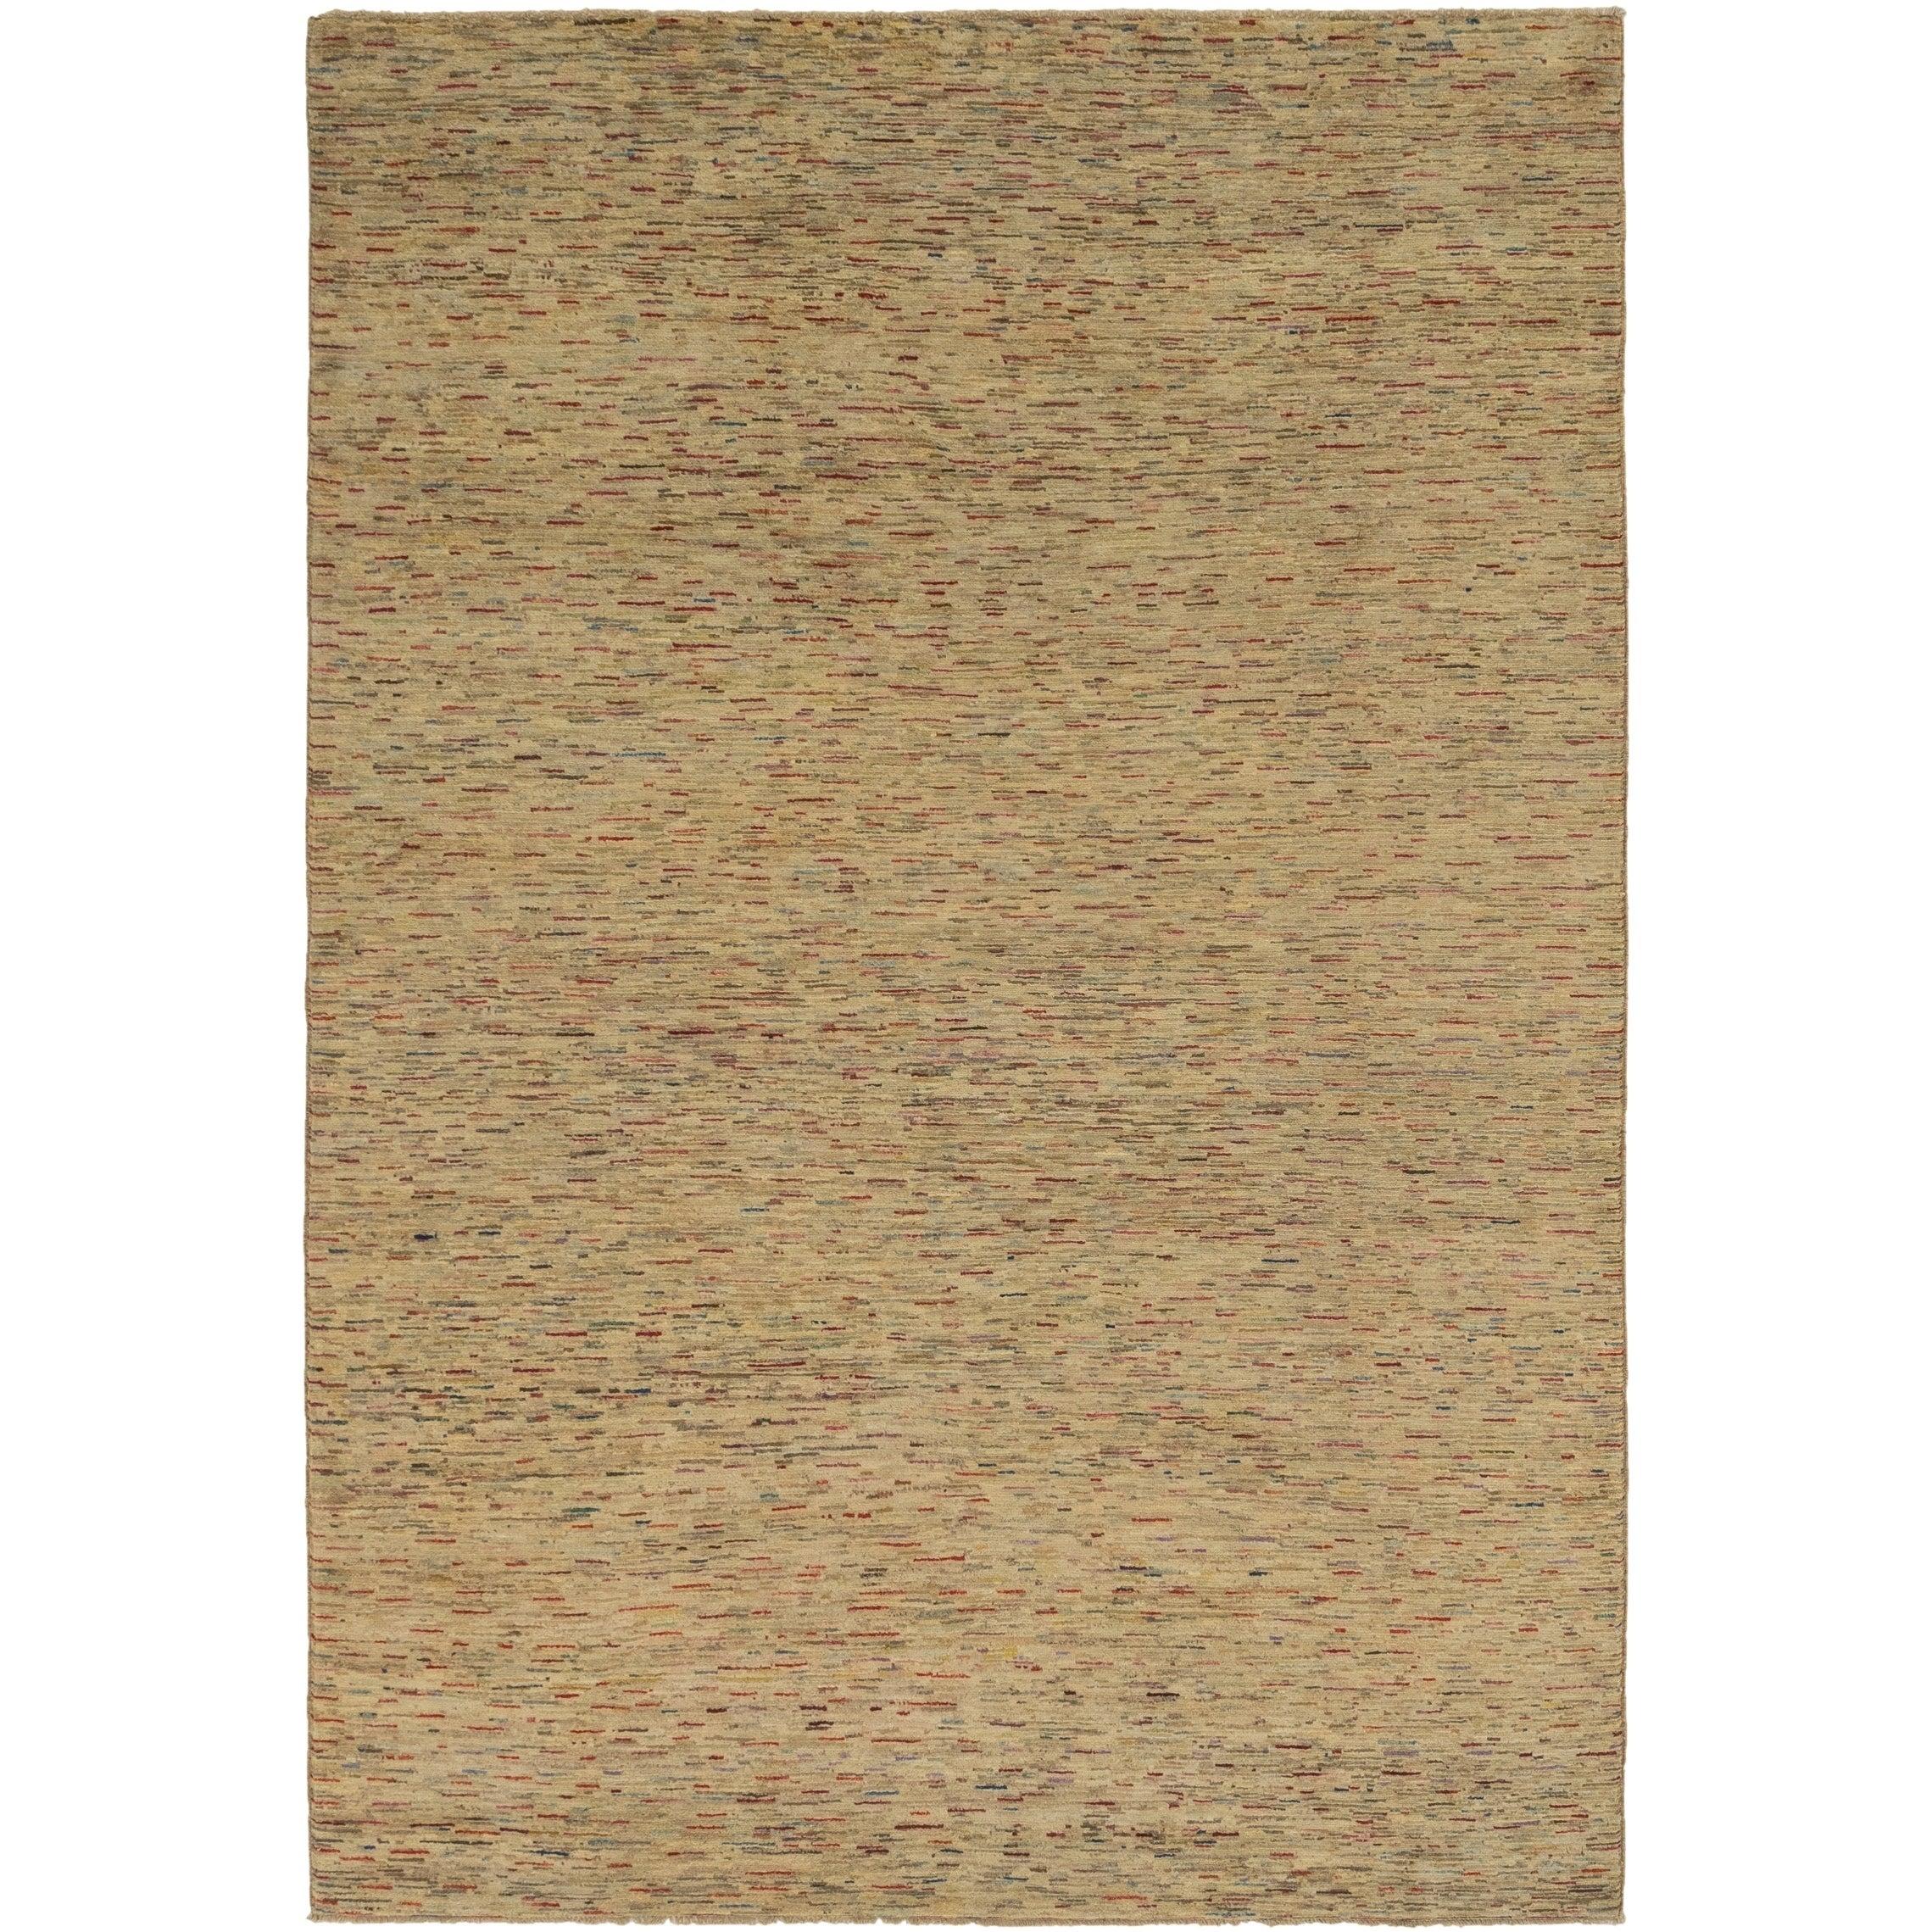 Hand Knotted Kashkuli Gabbeh Wool Area Rug - 6 7 x 9 6 (Multi - 6 7 x 9 6)